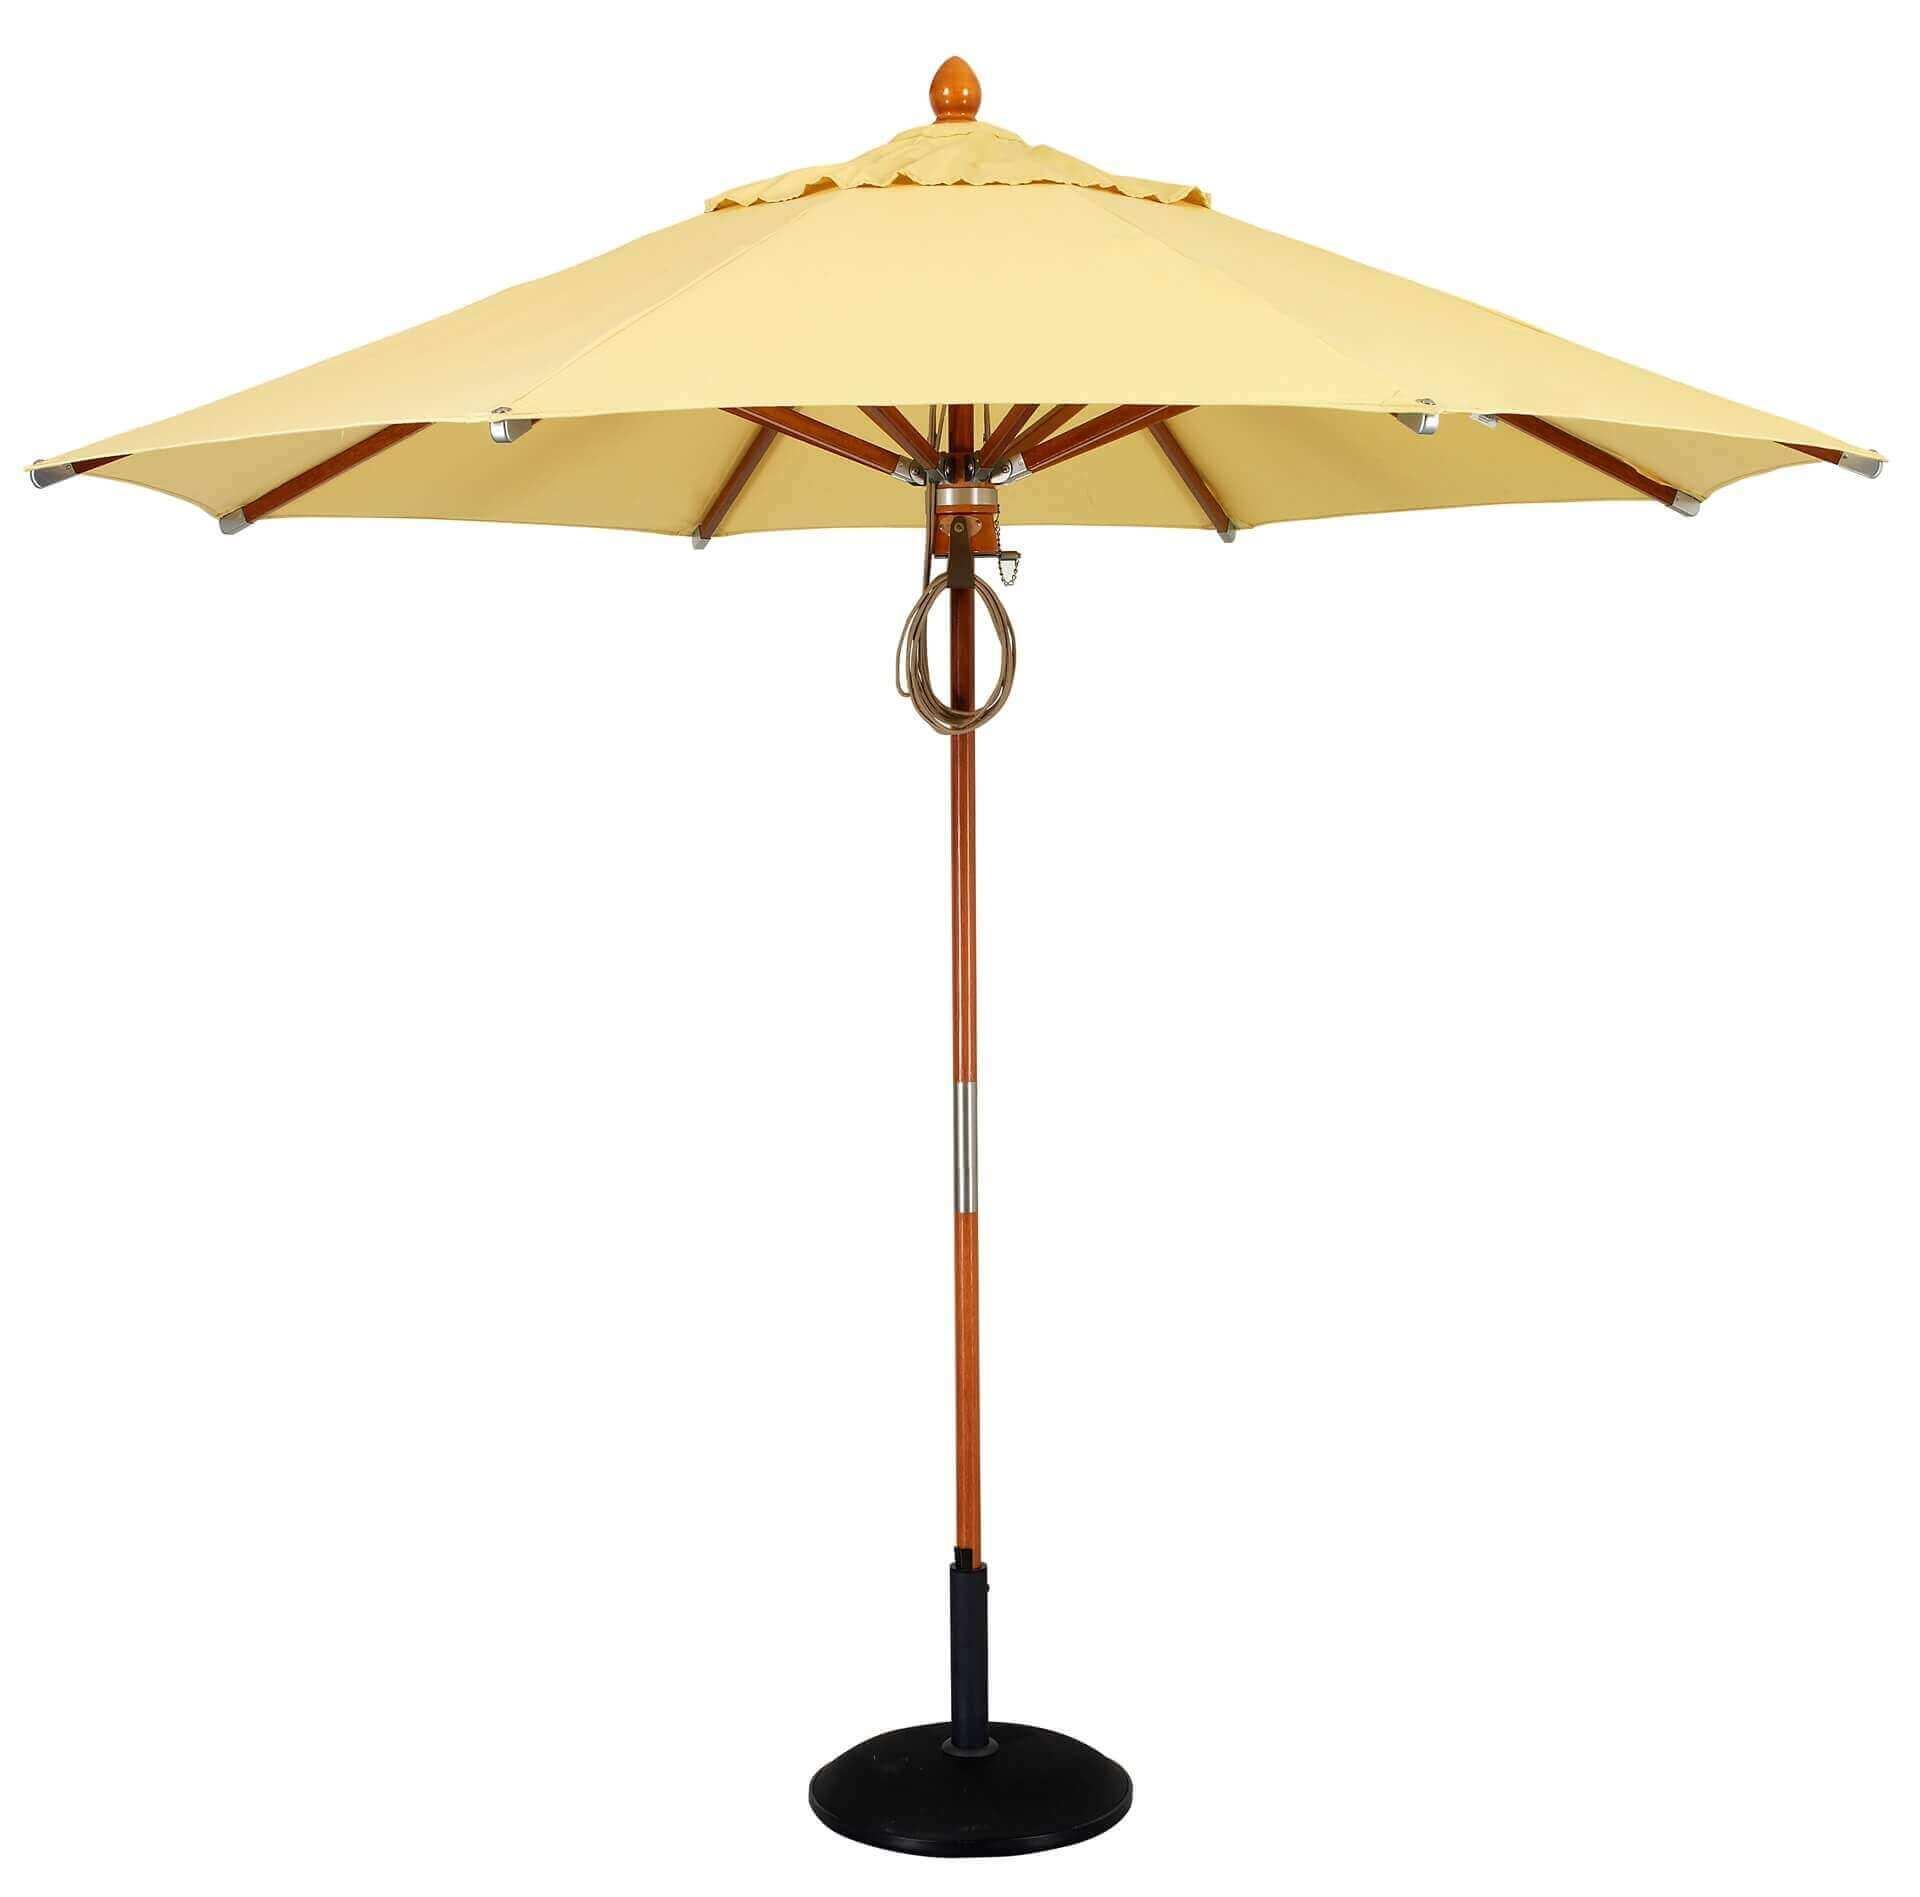 Commercial Market Umbrellas 9 Foot Diameter Wood 8 Rib Umbrella Sunbrella Marine Grade Fabric